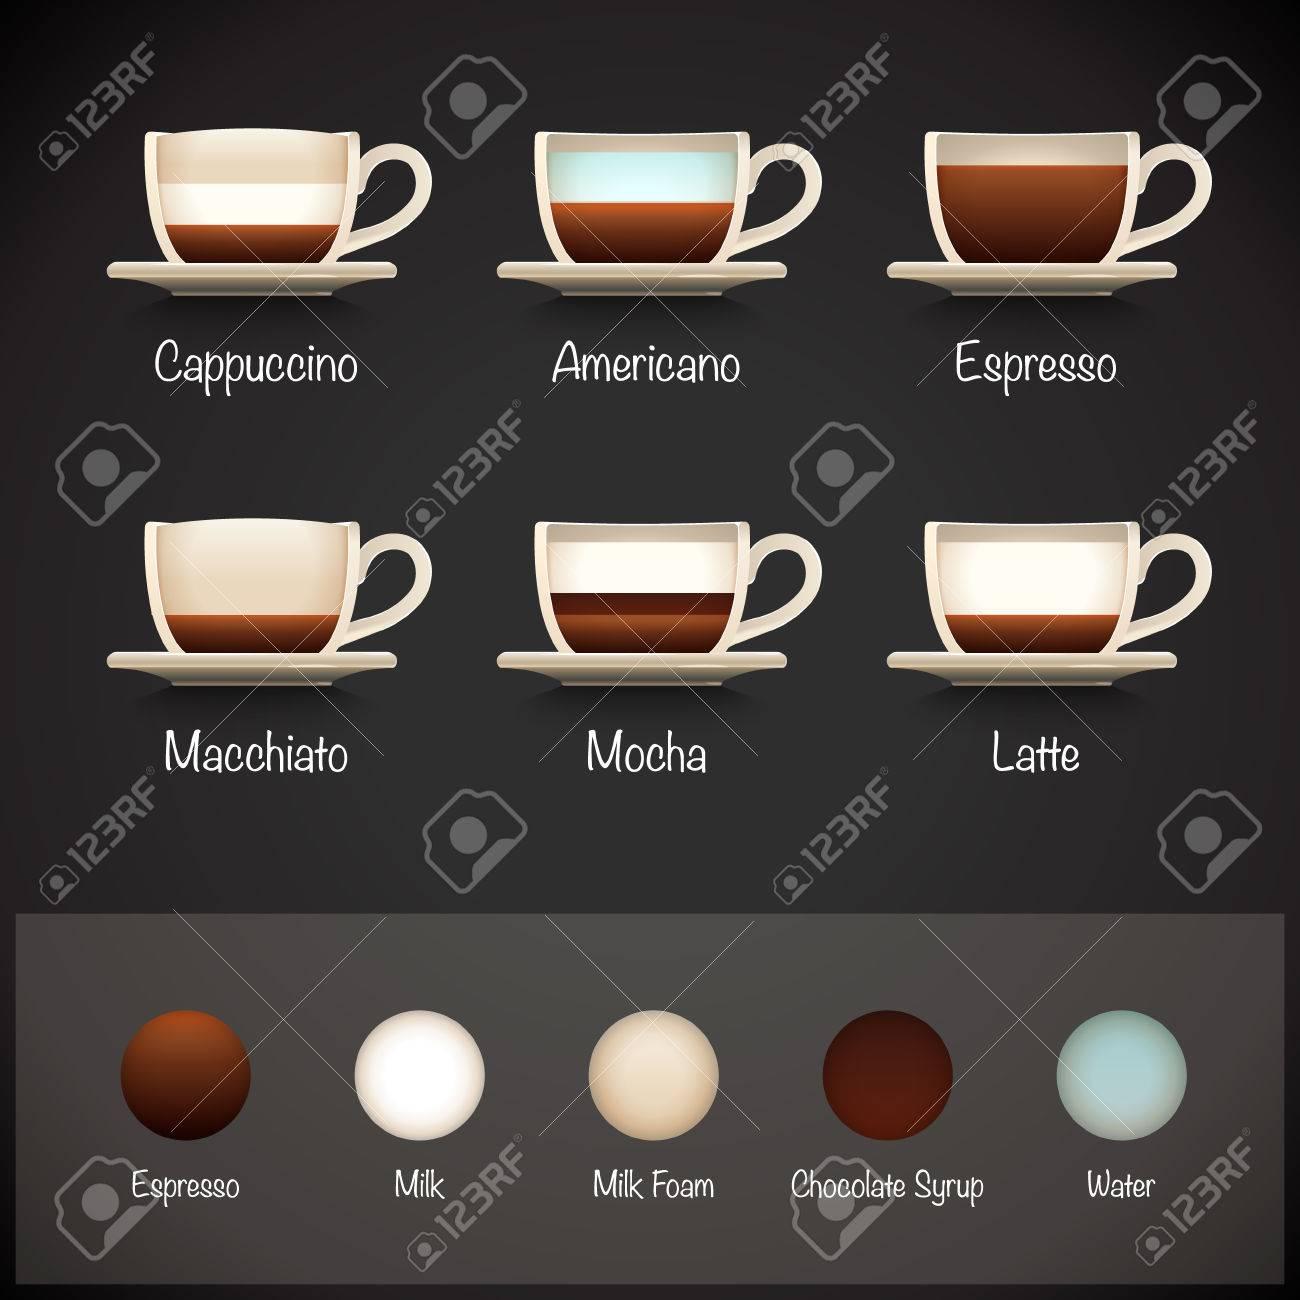 Kaffeearten Infografik. Vector Kaffeegetränke Führer Mit Ihren ...